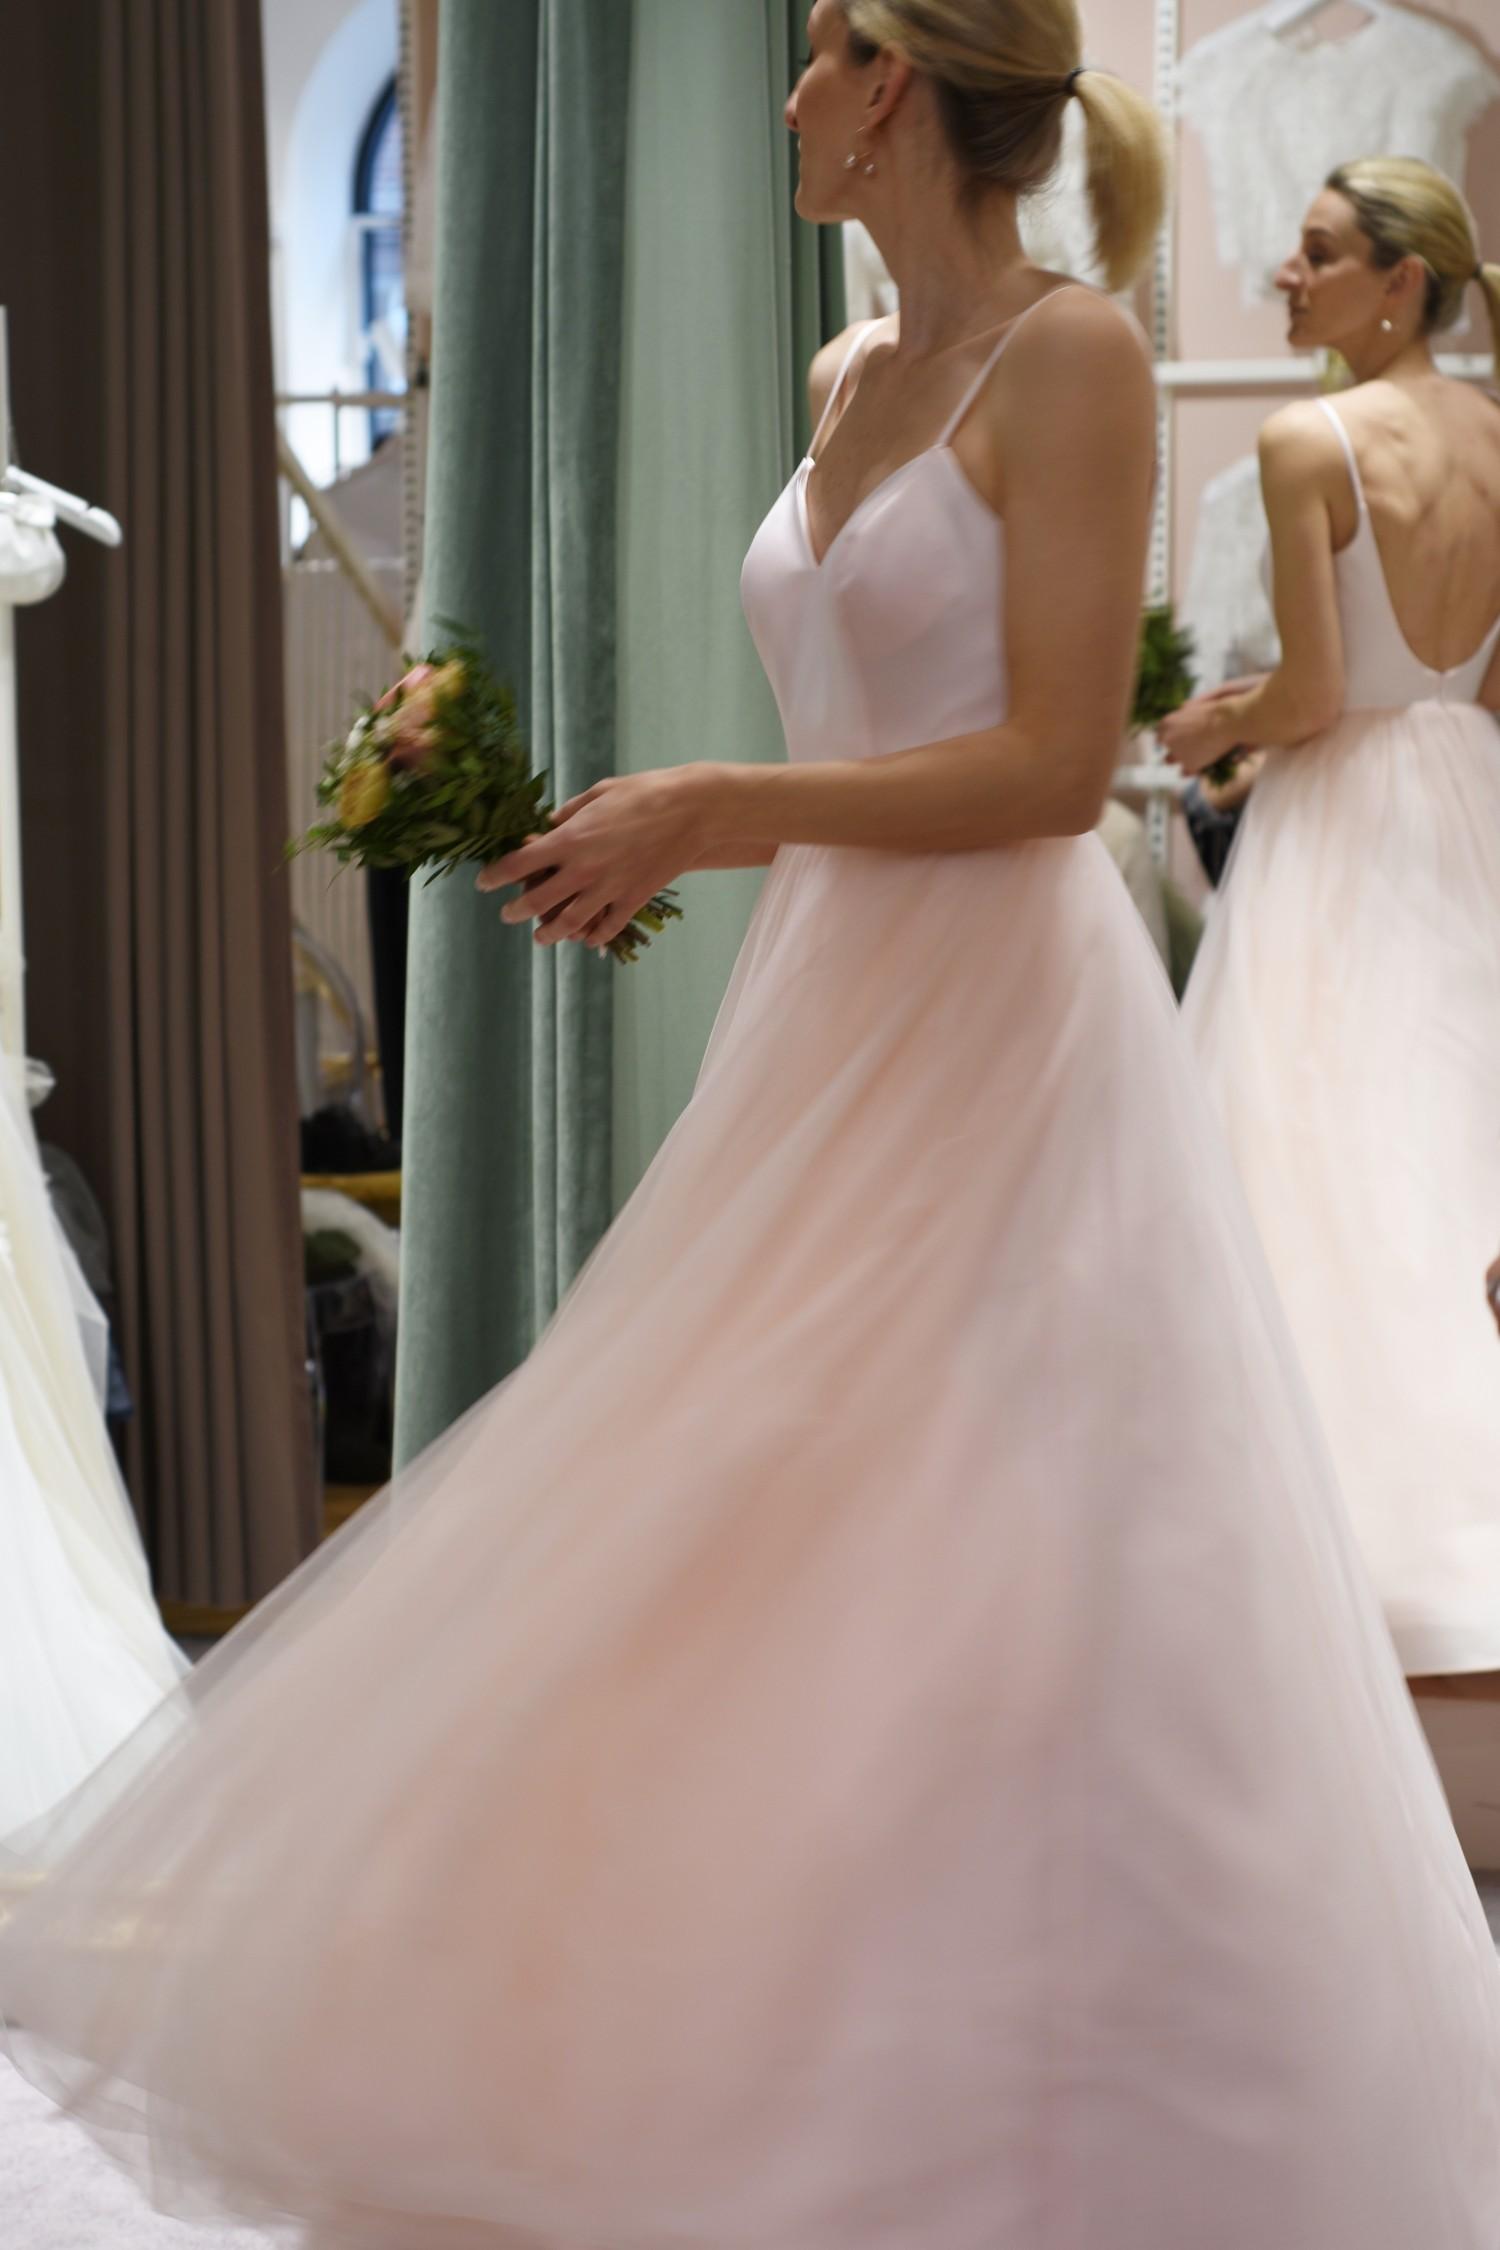 lilly-brudekjoler-annemette-voss-54